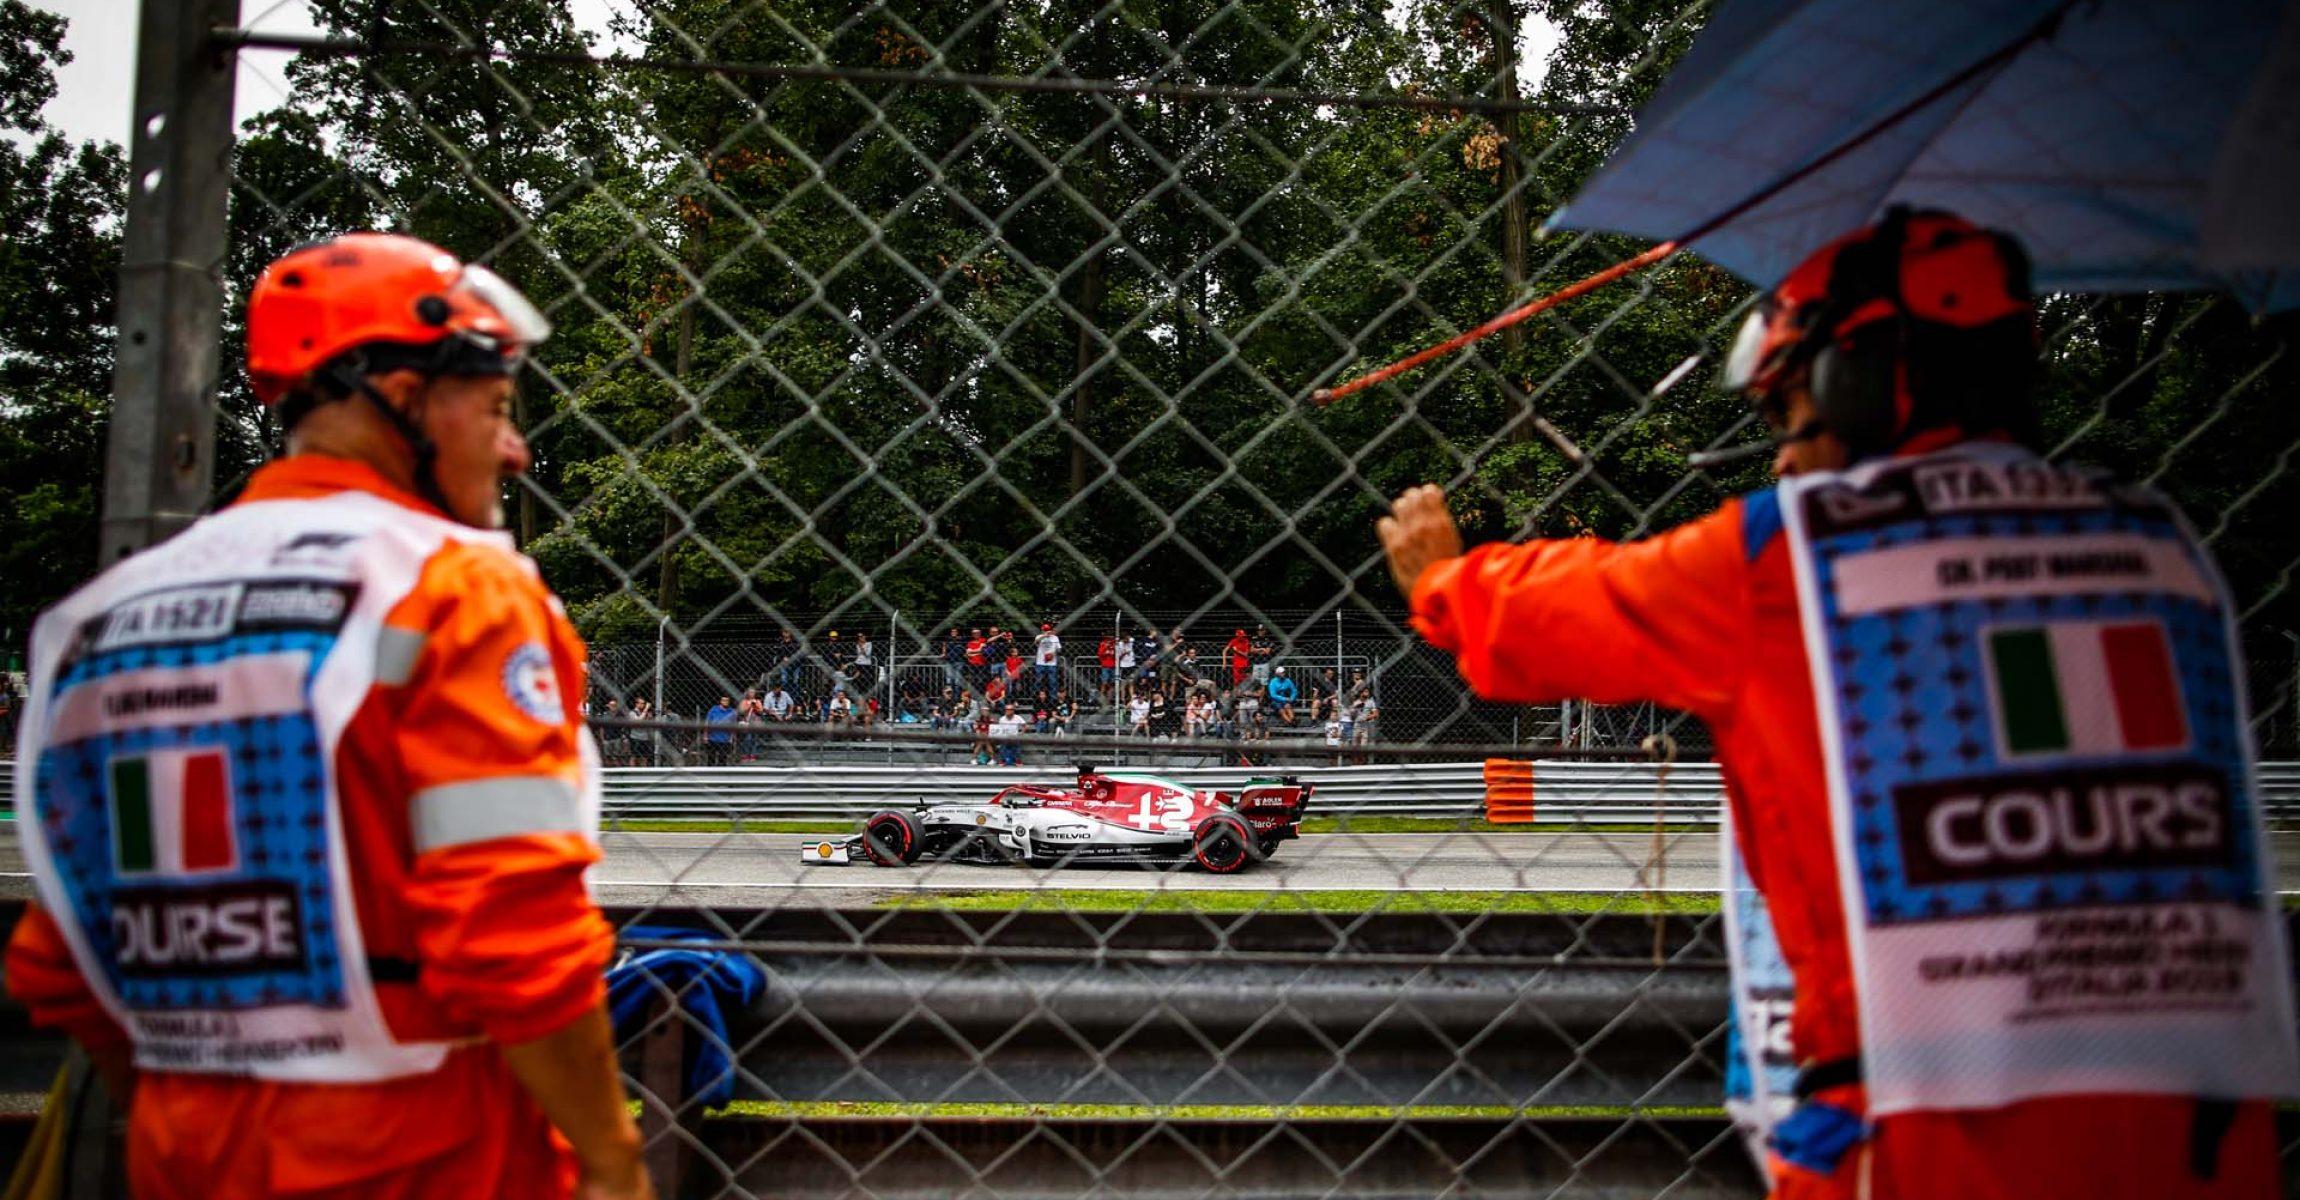 07 RAIKKONEN Kimi Räikkönen (fin), Alfa Romeo Racing C38, action during 2019 Formula 1 FIA world championship, Italy Grand Prix, at Monza from september 5 to 9 - Photo Florent Gooden / DPPI